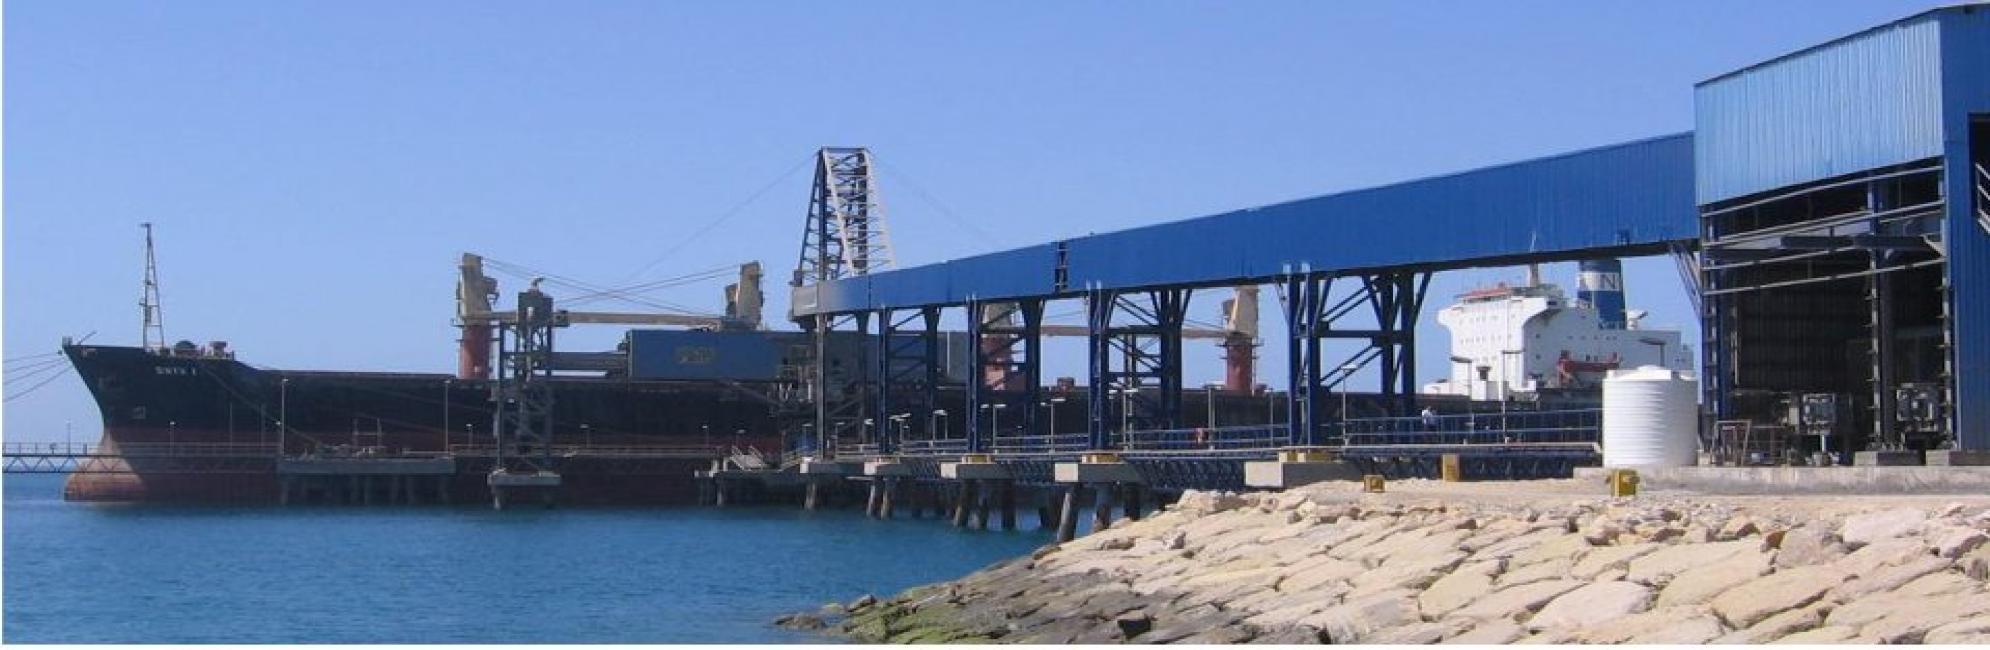 Sarooj  50,000 DWT Berth,Shiploader 1200 Ton/hr,Conveyor  Kangan,Busher Province